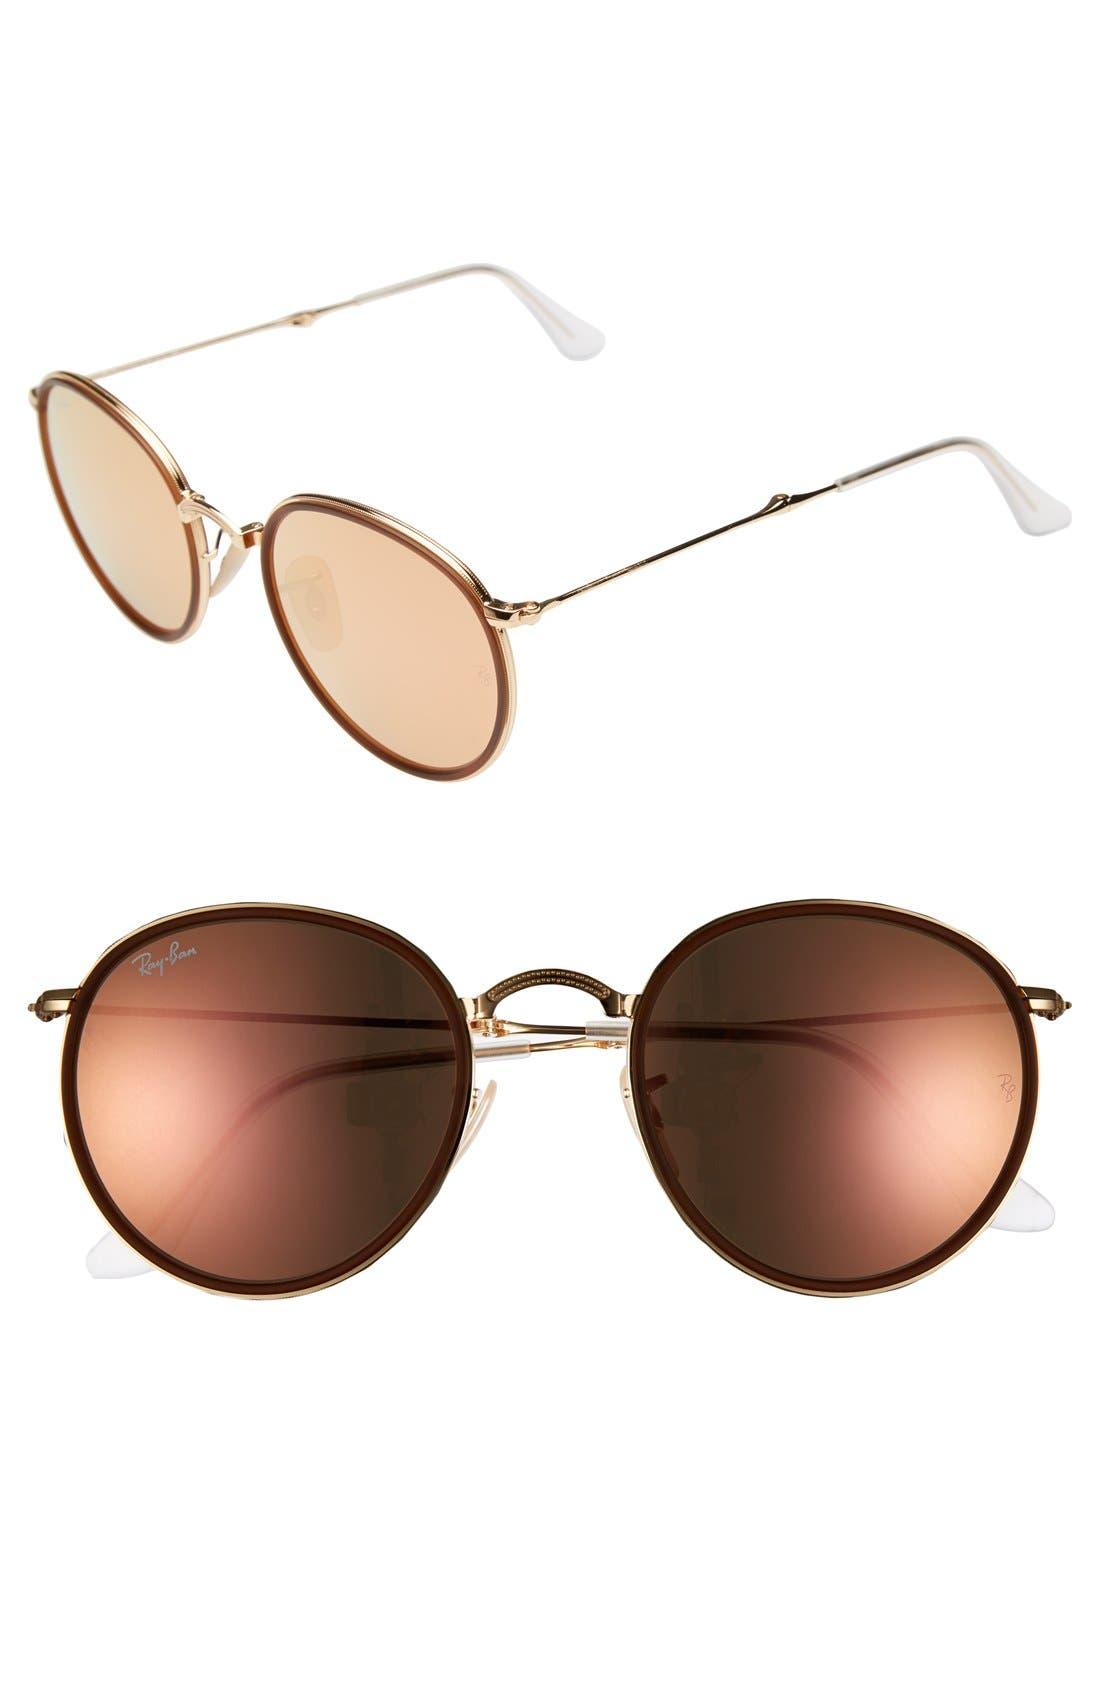 Alternate Image 1 Selected - Ray-Ban 51mm Foldable Sunglasses